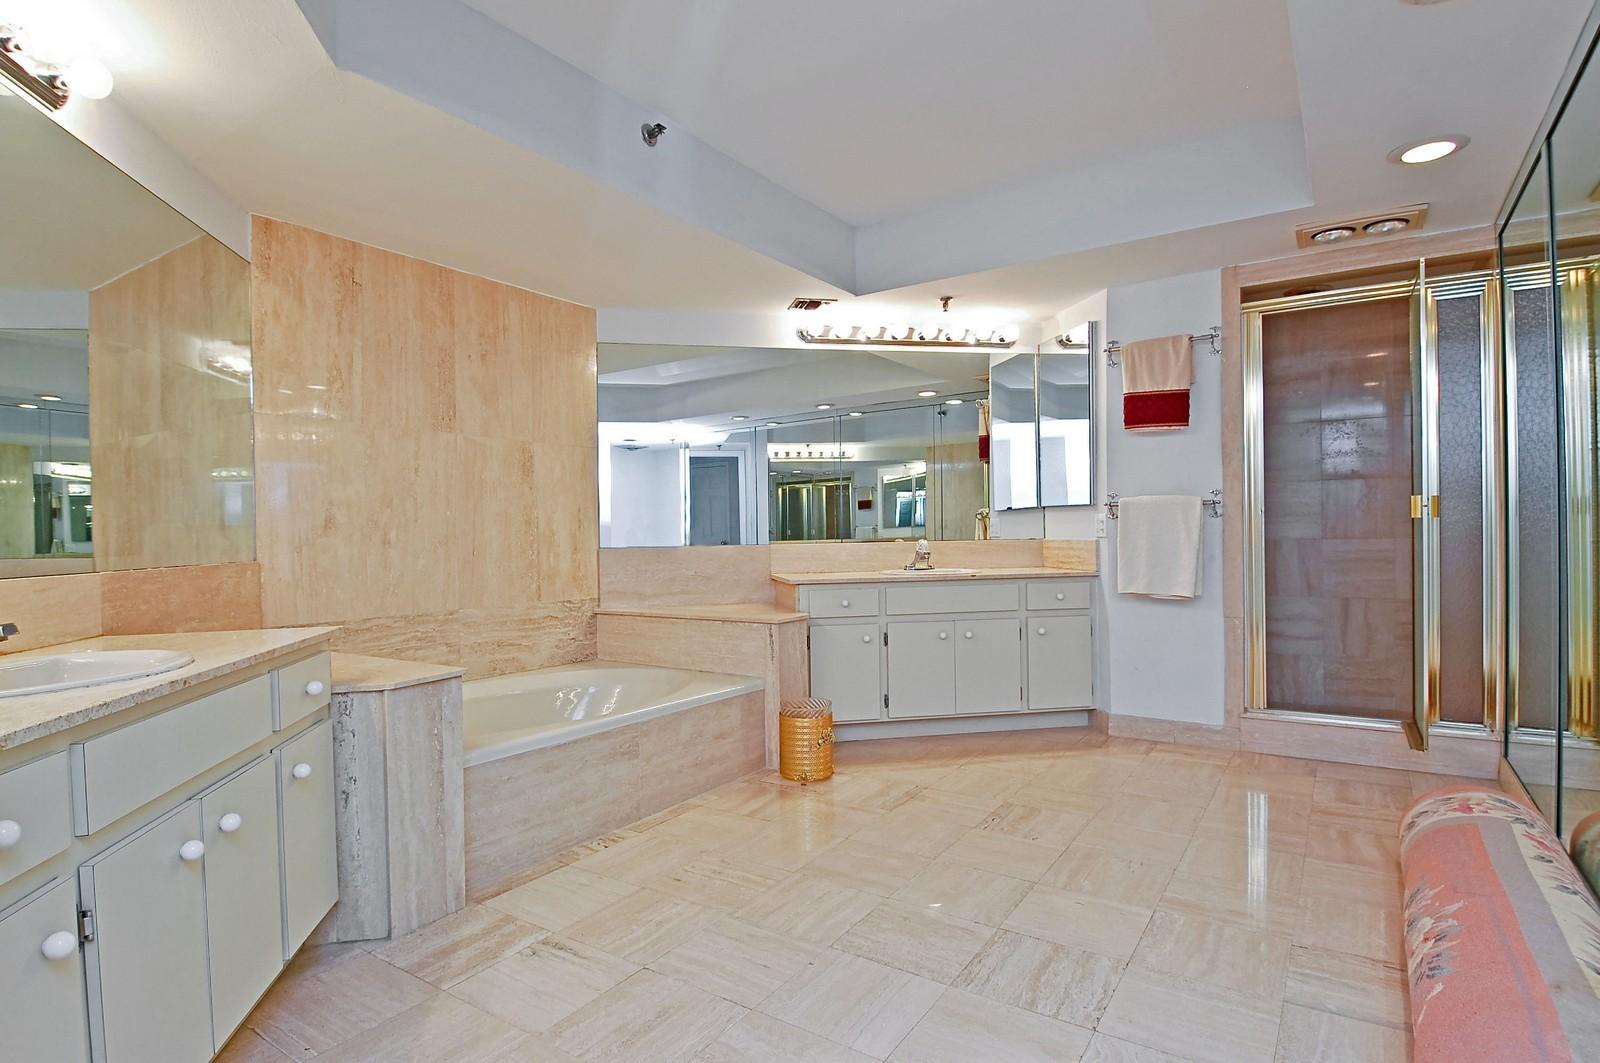 Real Estate Photography - 4605 S Ocean Blvd, Unit 3B, Highland Beach, FL, 33487 - Master Bathroom